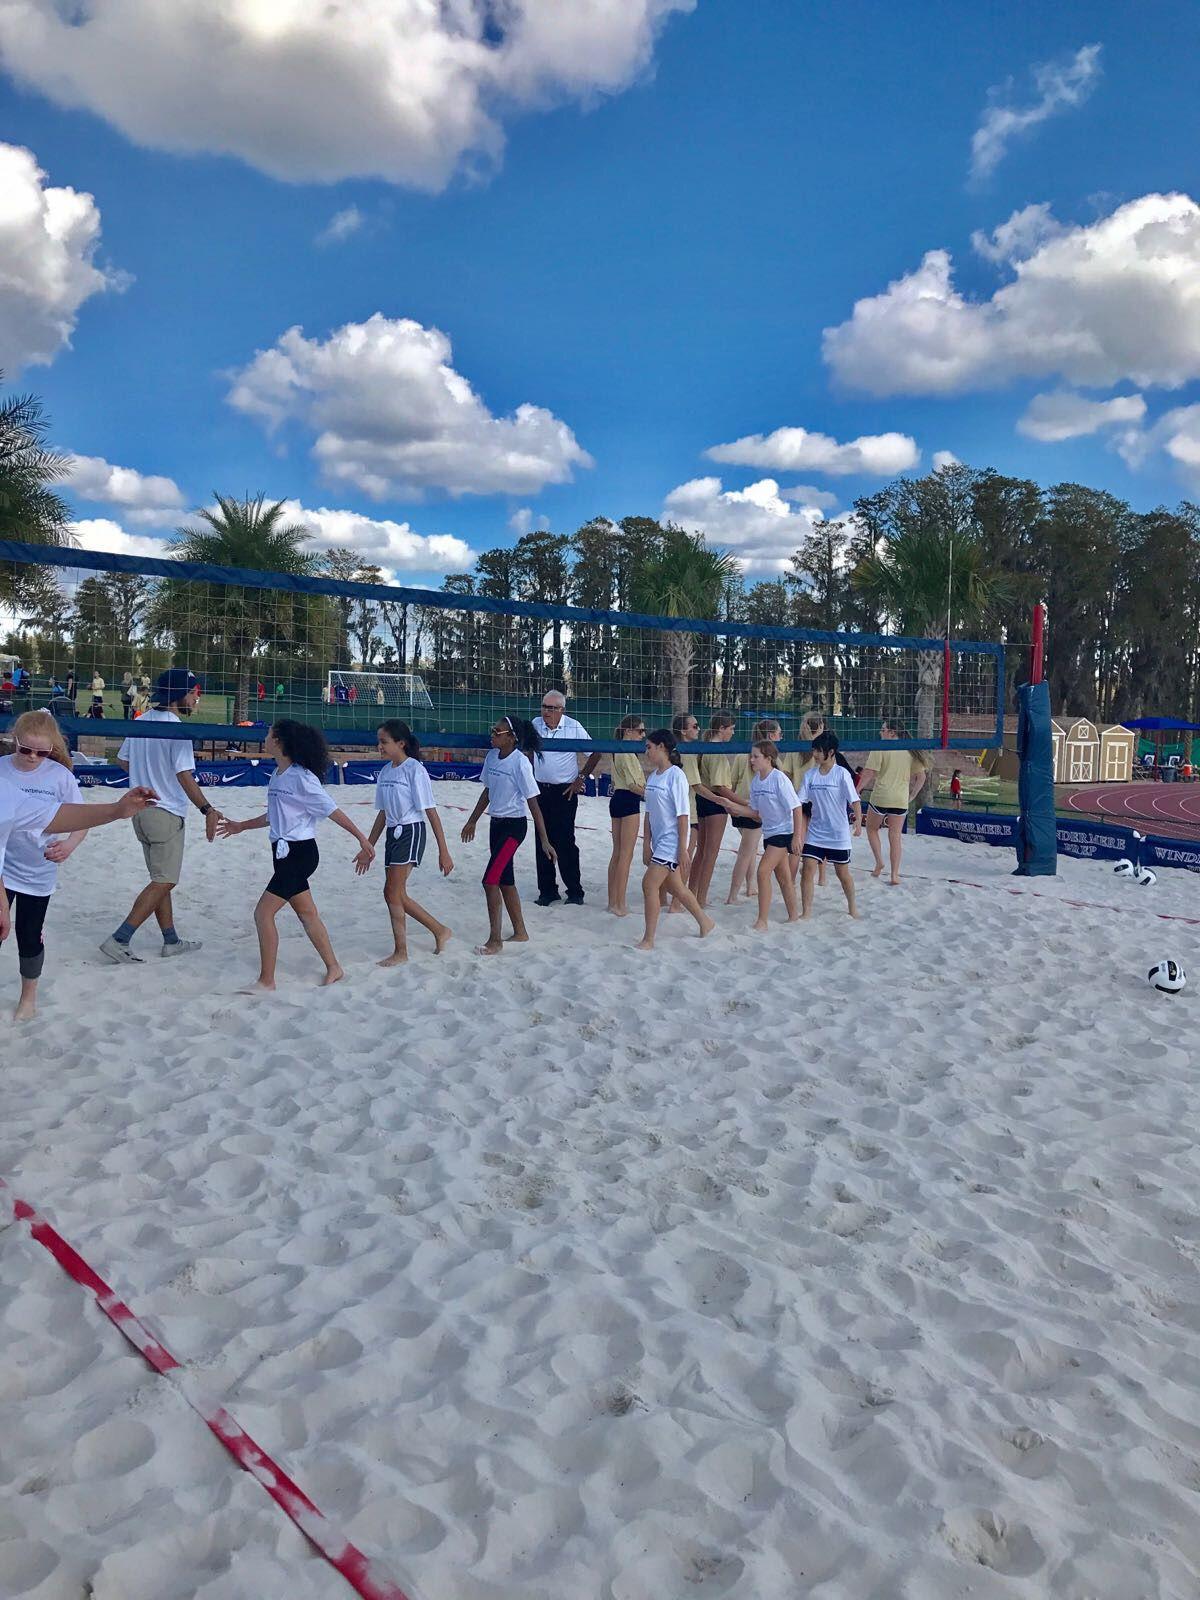 Naeglobalgames Globalgamesna Girls Sand Volleyball Underway Global Dolores Park Sportsmanship